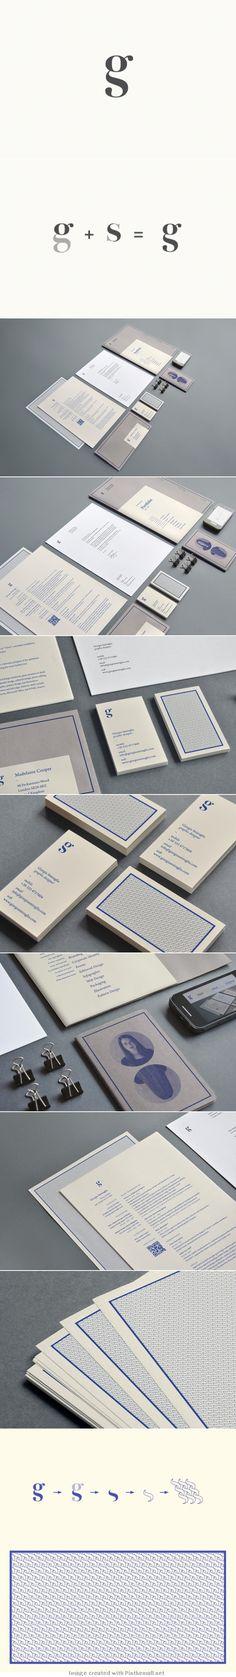 logo corporate photo visual graphic identity kraft paper design business card label black white print sticker minimal personal branding pattern